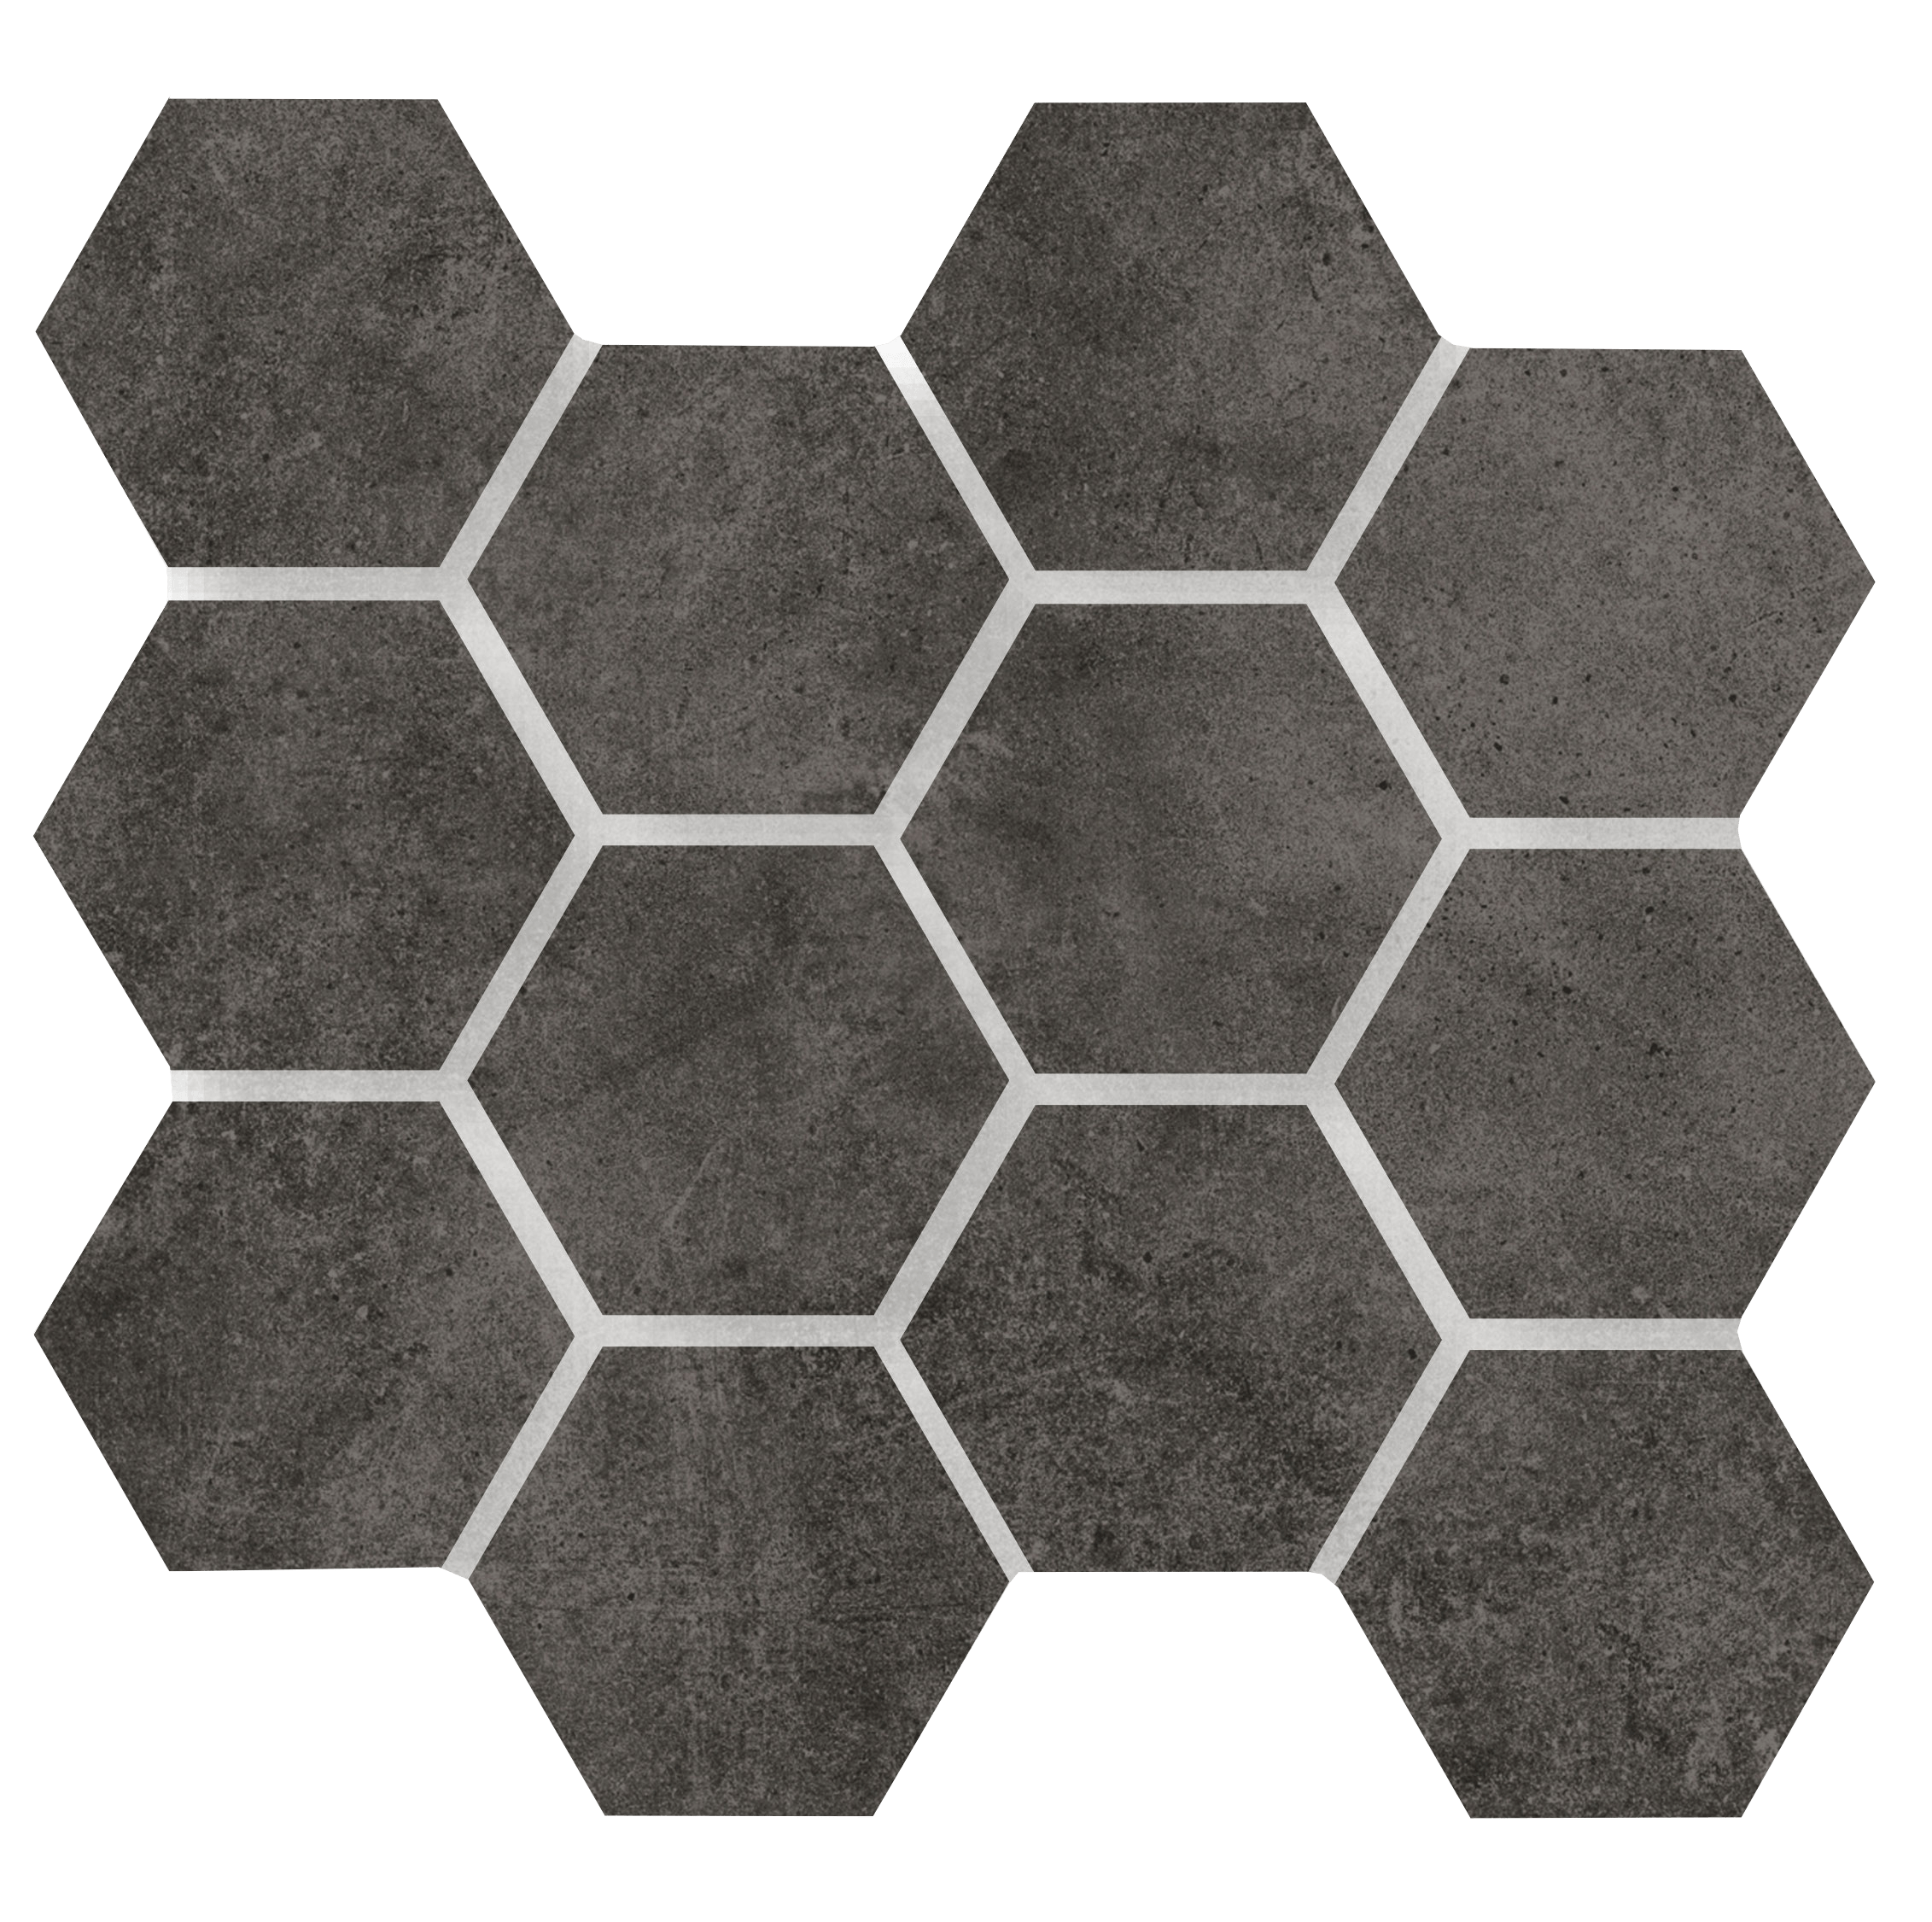 CAPETOWN 32,8 x 30,6 (8,6 x 8,6) anthrazit Image